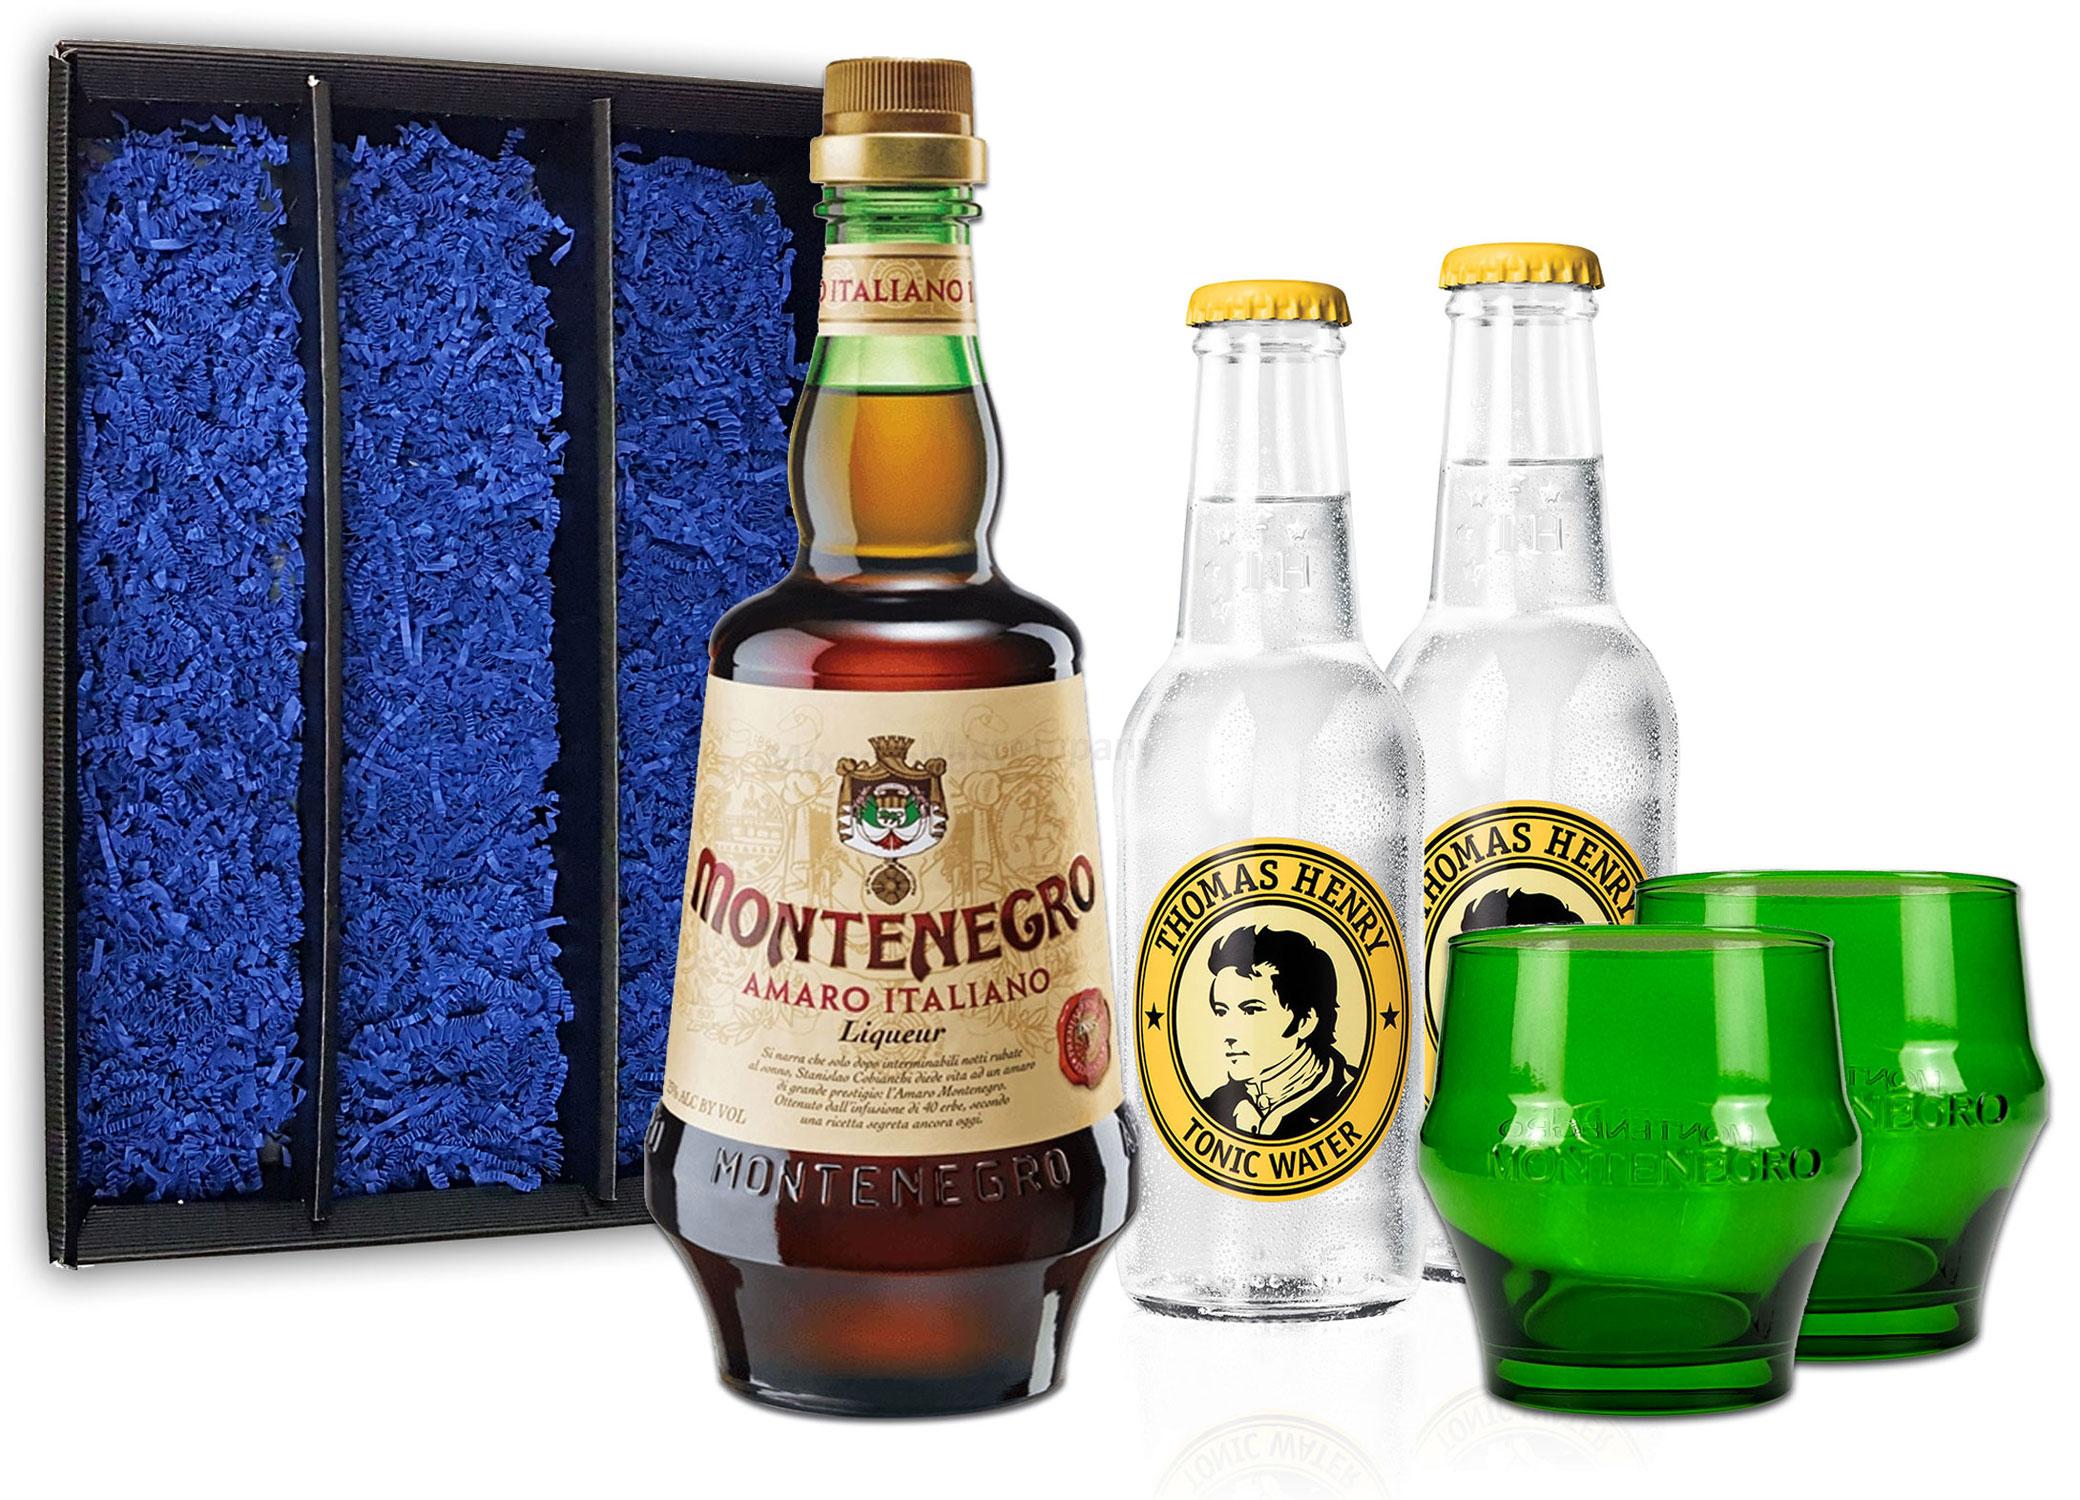 Montenegro & Tonic Geschenkset - Montenegro Amaro Italiano Likör 0,7L (23% Vol) + 2x Thomas Henry Tonic Water 200ml inkl. Pfand MEHRWEG + 2x Gläser Shot Glas grün